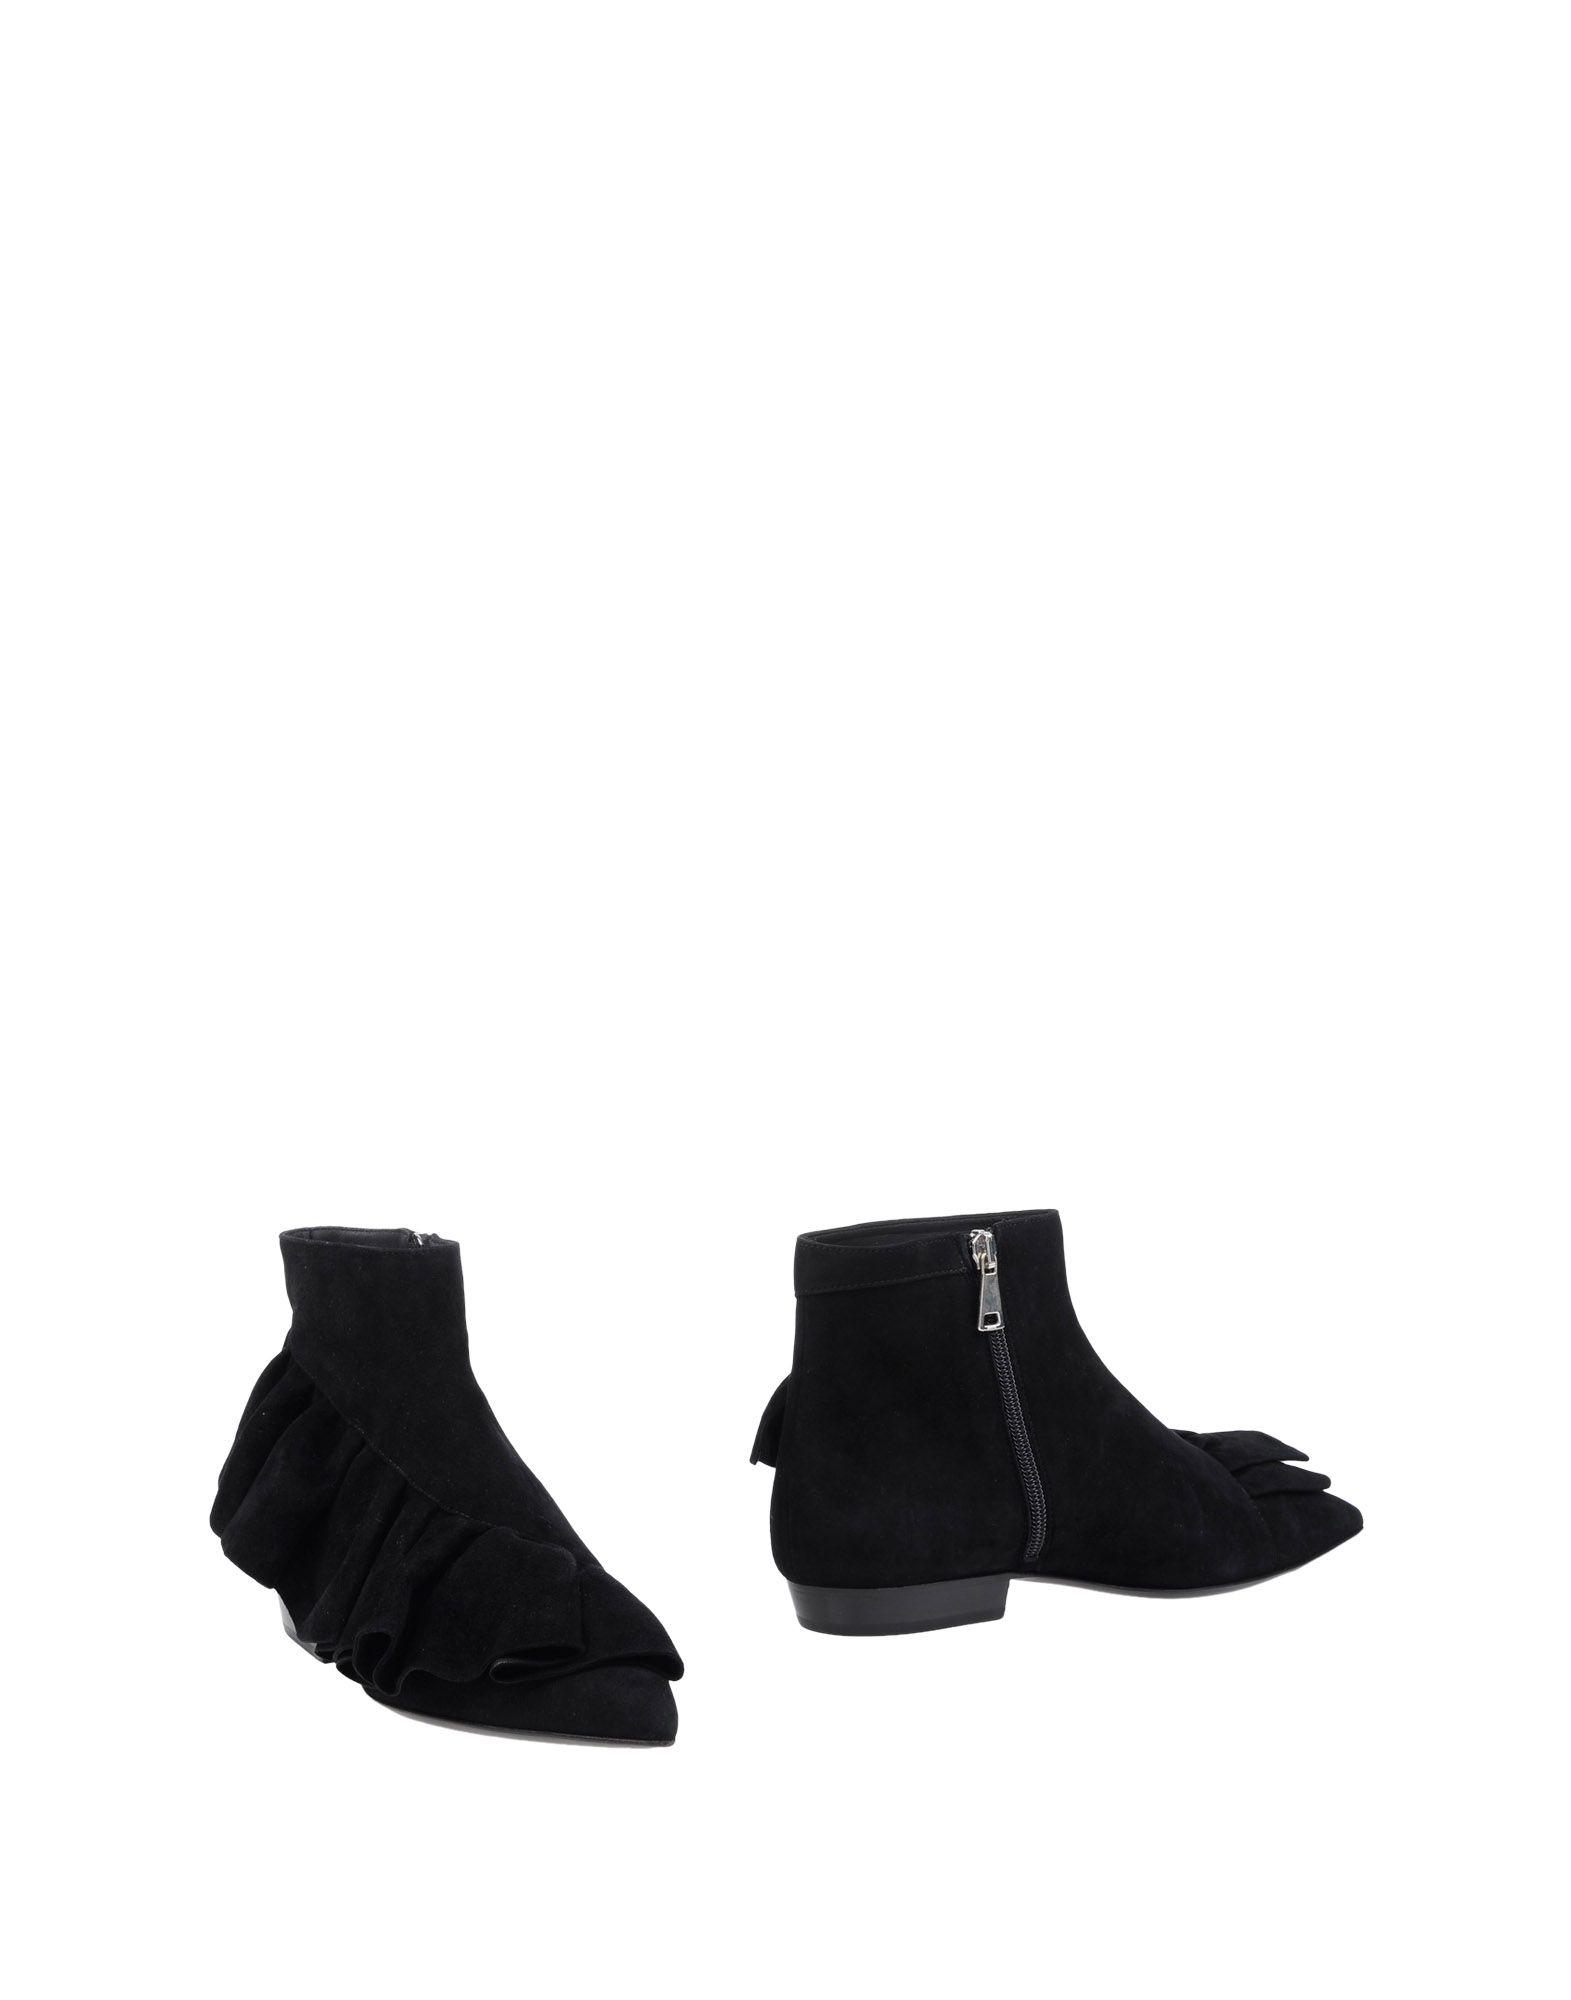 J.W.Anderson Stiefelette strapazierfähige Damen  11365242SHGut aussehende strapazierfähige Stiefelette Schuhe 915344